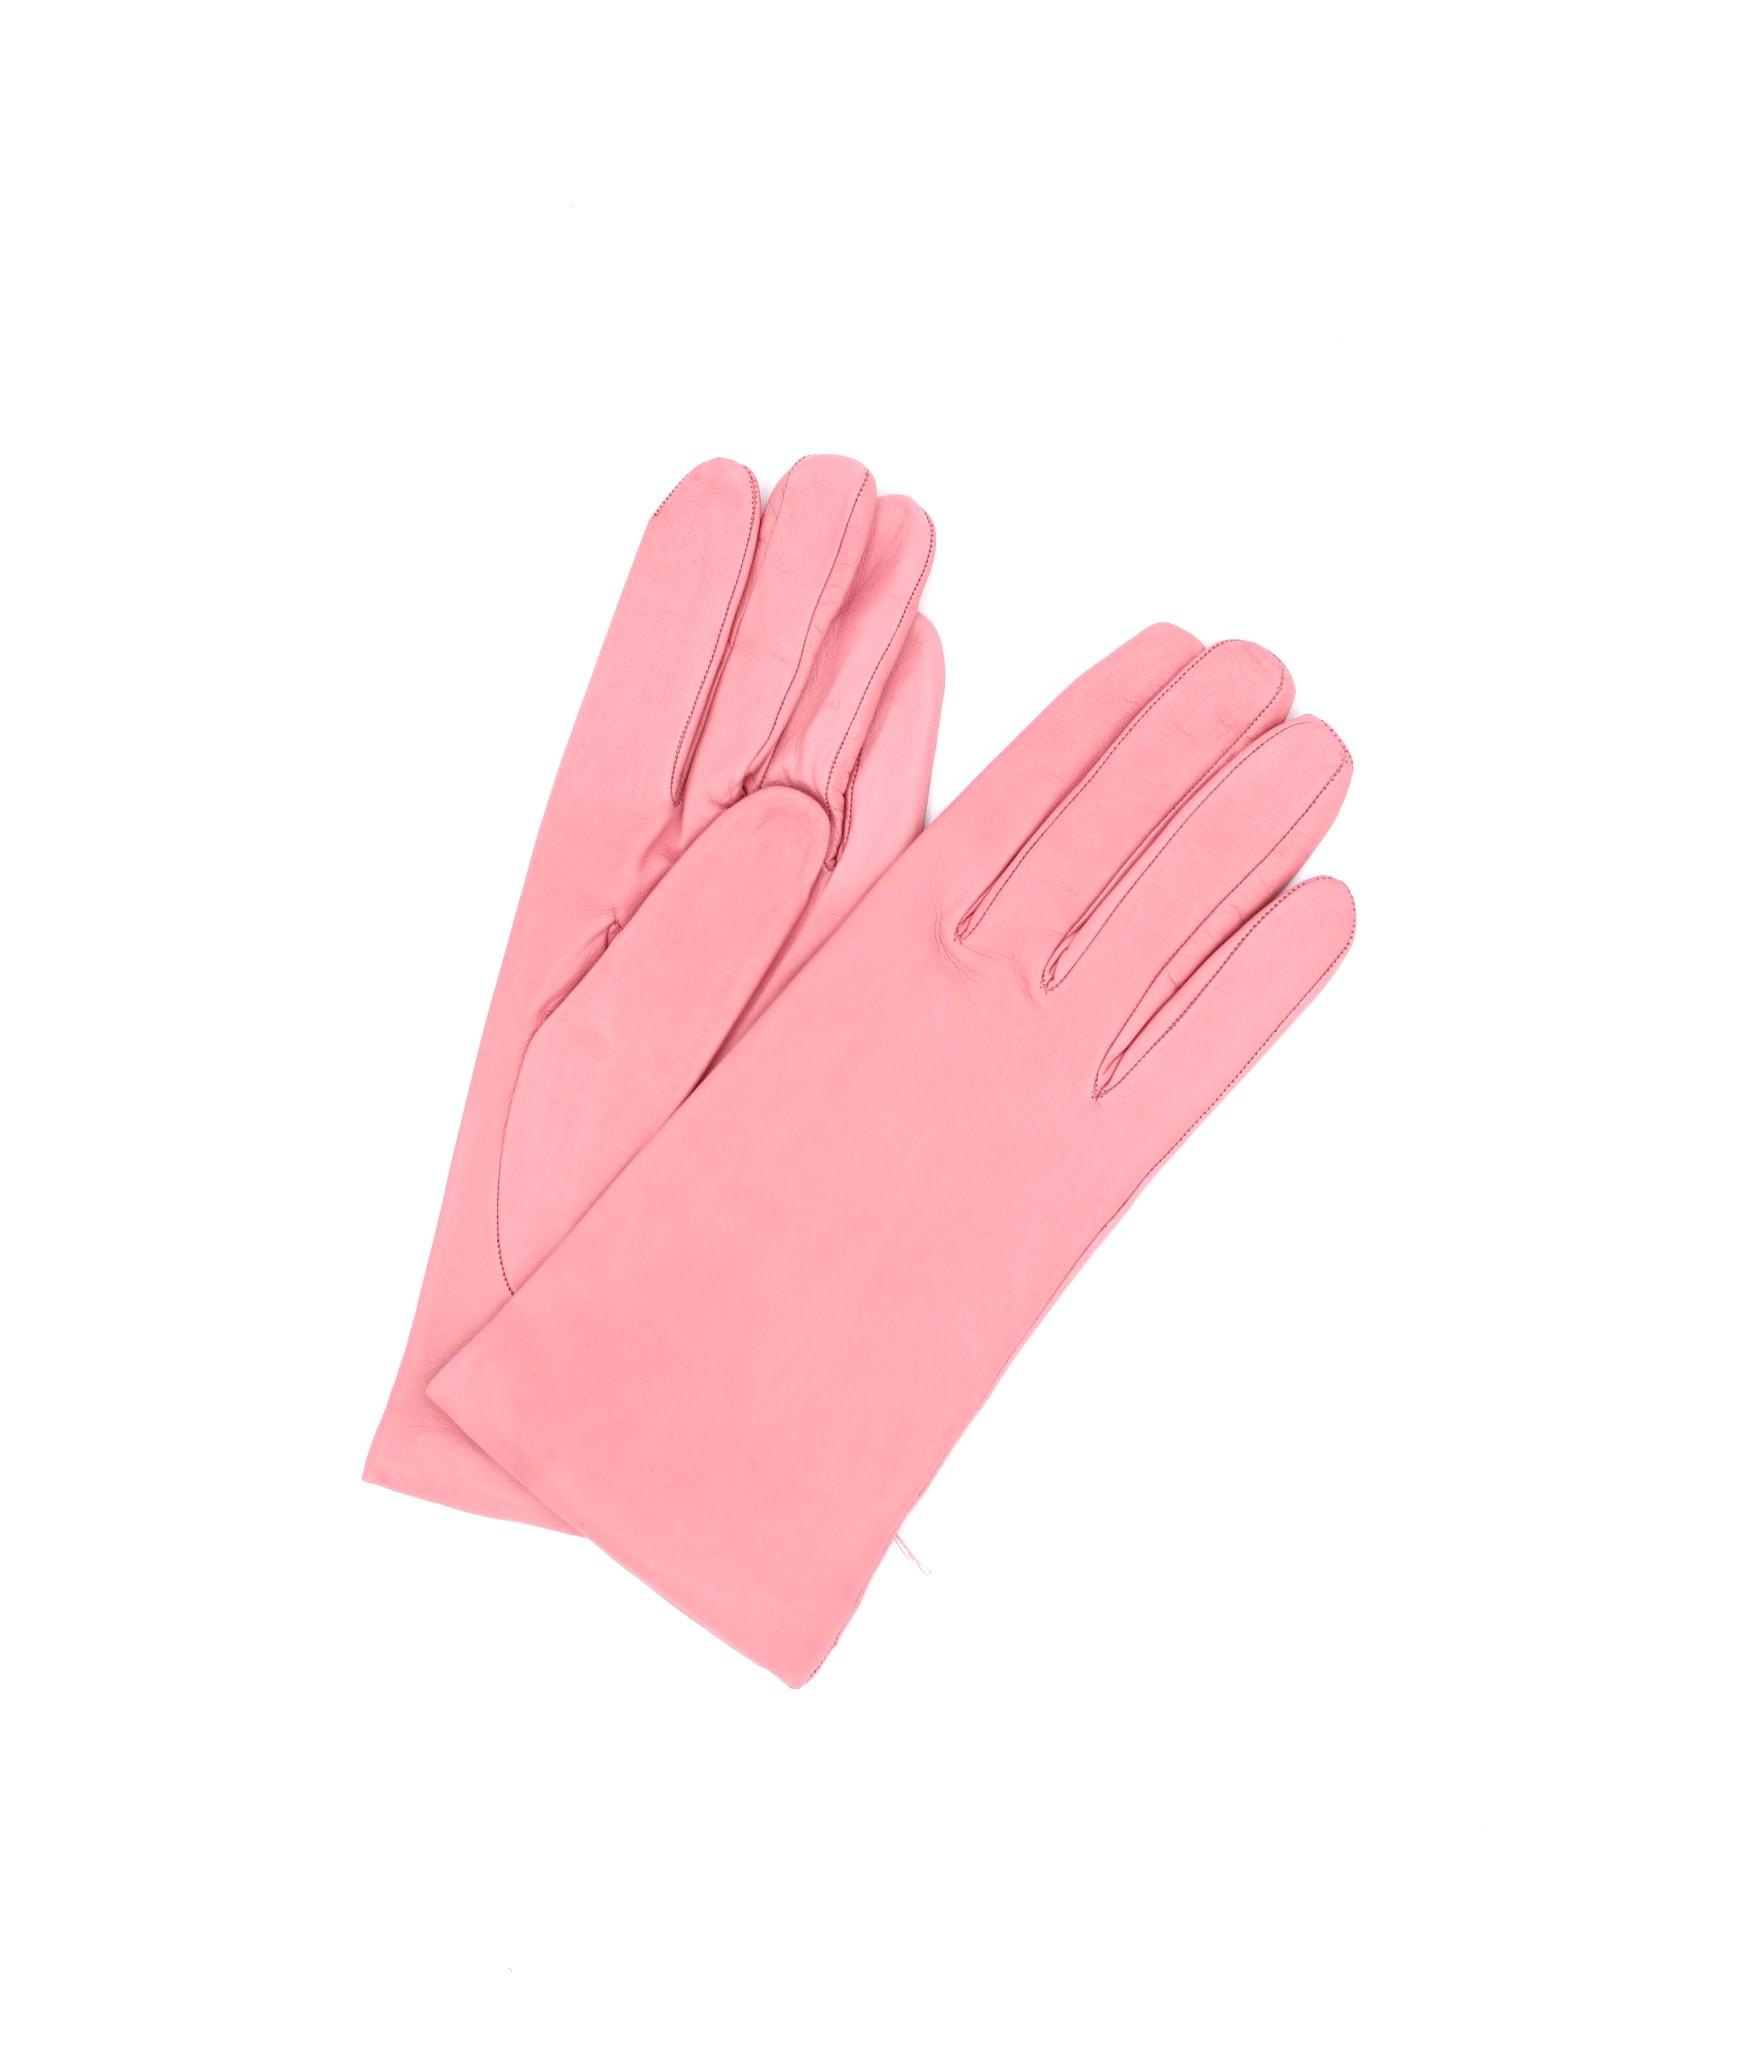 Nappa leather gloves Cashmere lined Bubble gum Sermoneta Gloves